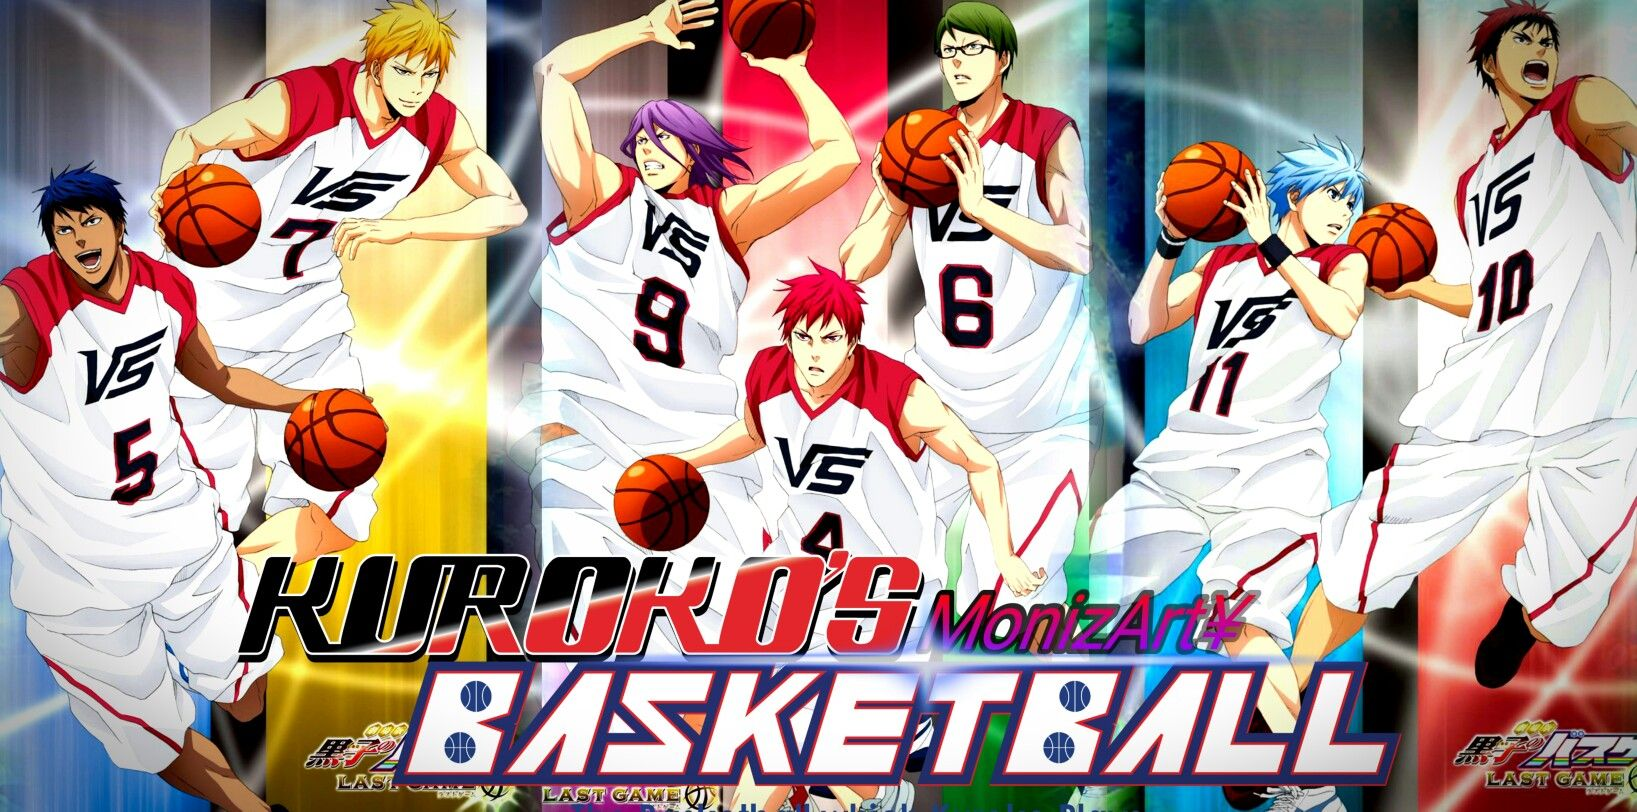 Kuroko No Basket Last Game Full Wallpaper Aomine Daiki